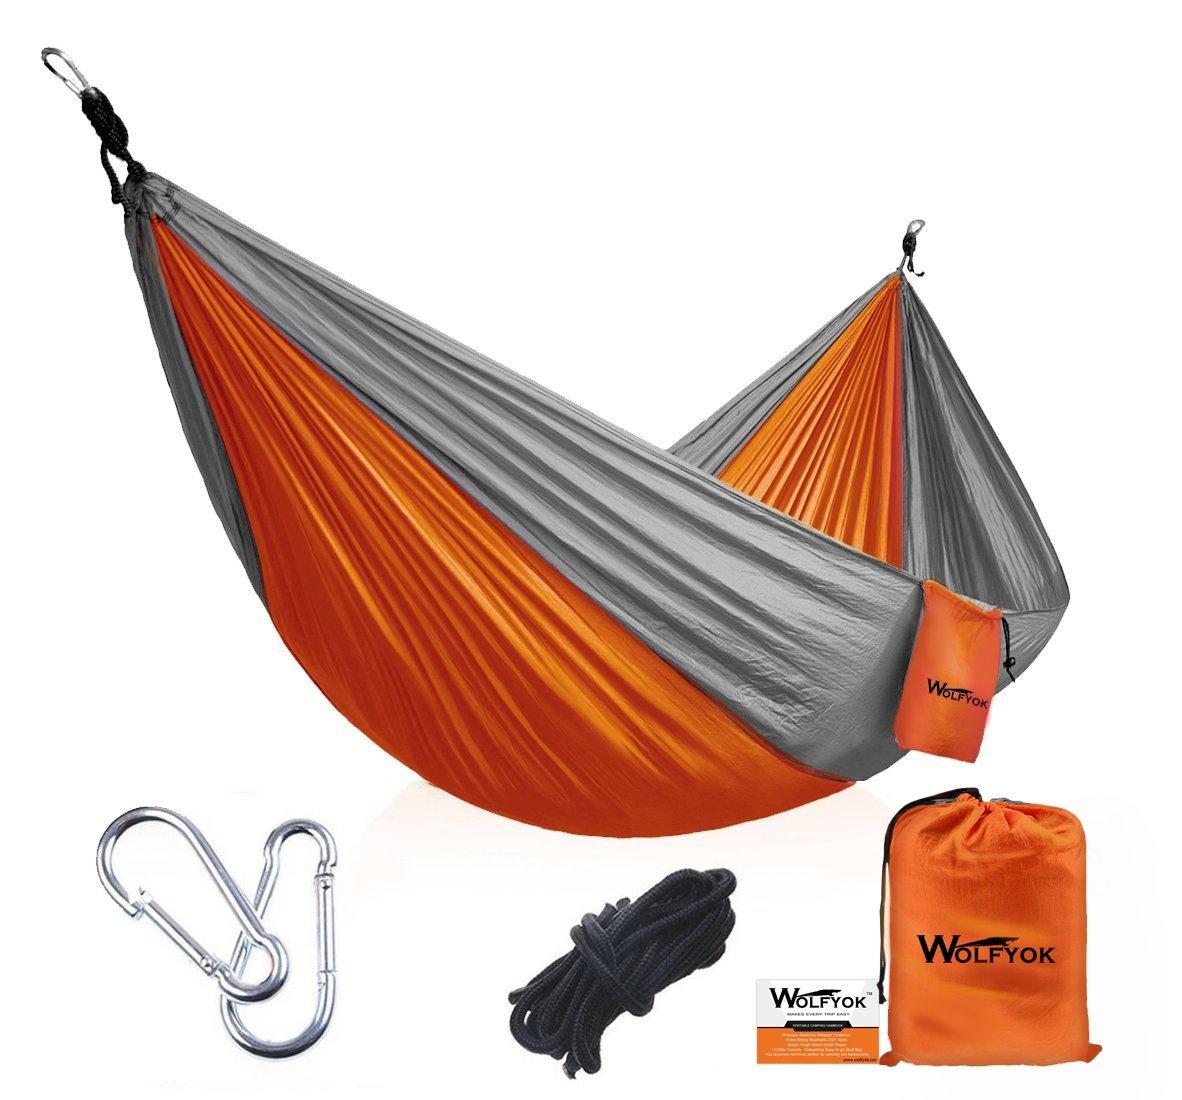 Portable Camping Hammock w/ropes and Carabiners [Single, Orange/Gray color] $14.99